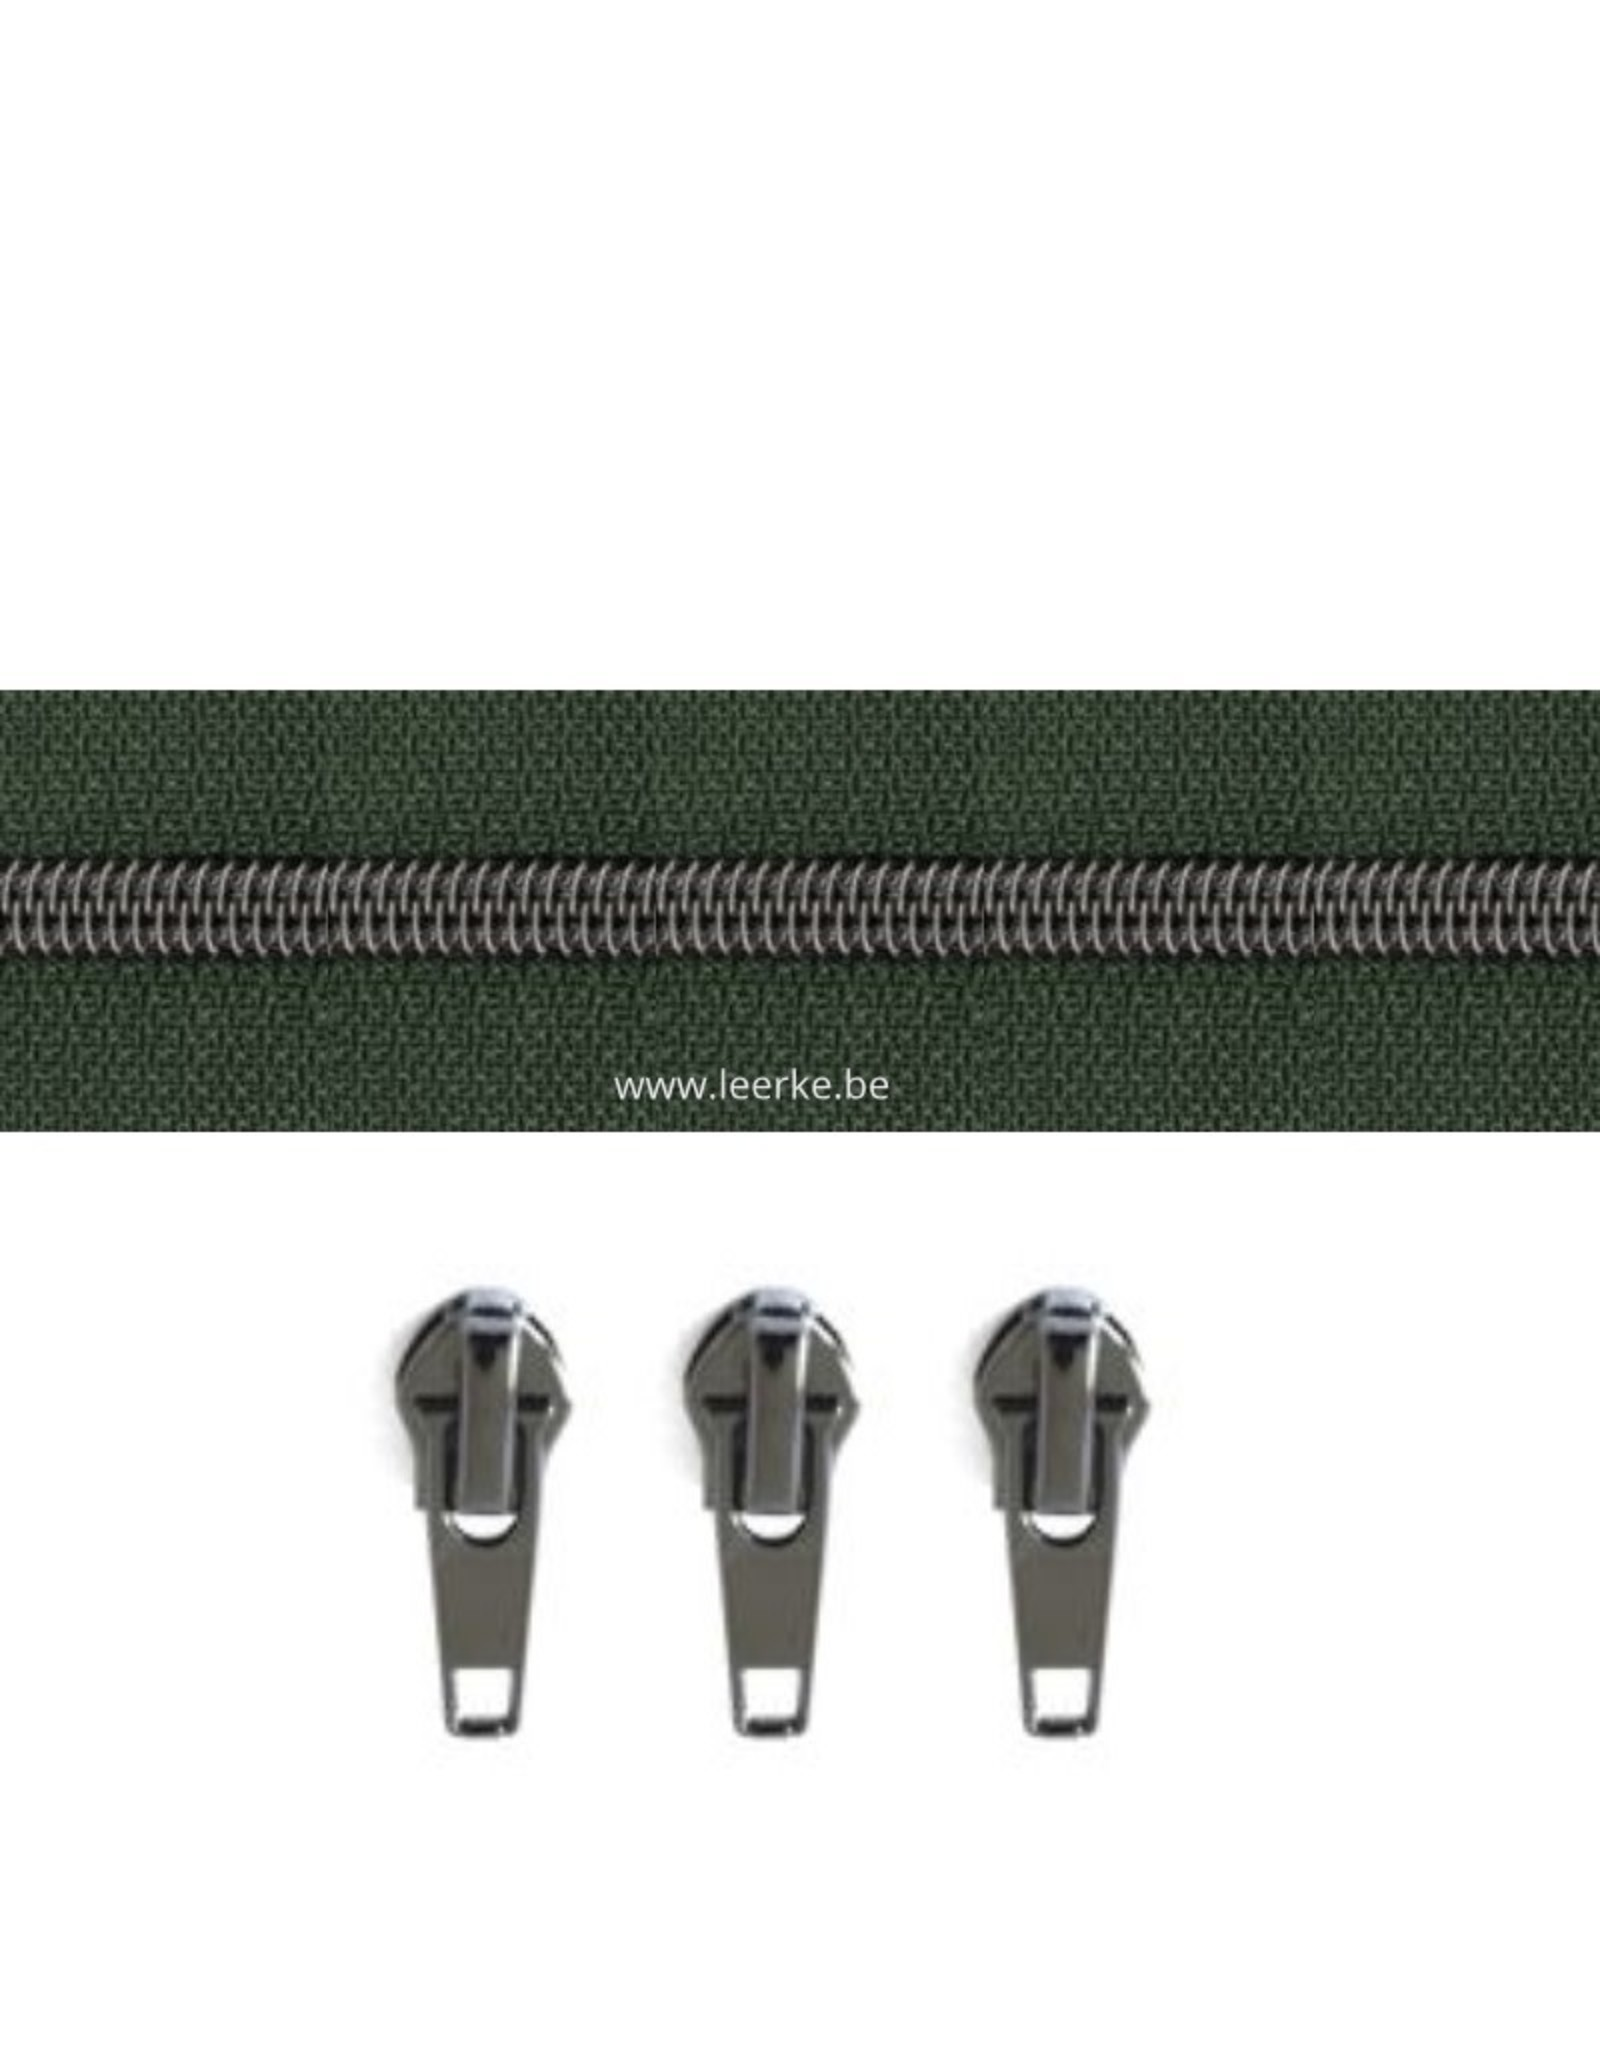 Rits per meter (incl. 3 trekkers) - Gunmetal - Donkergroen - Size 6,5